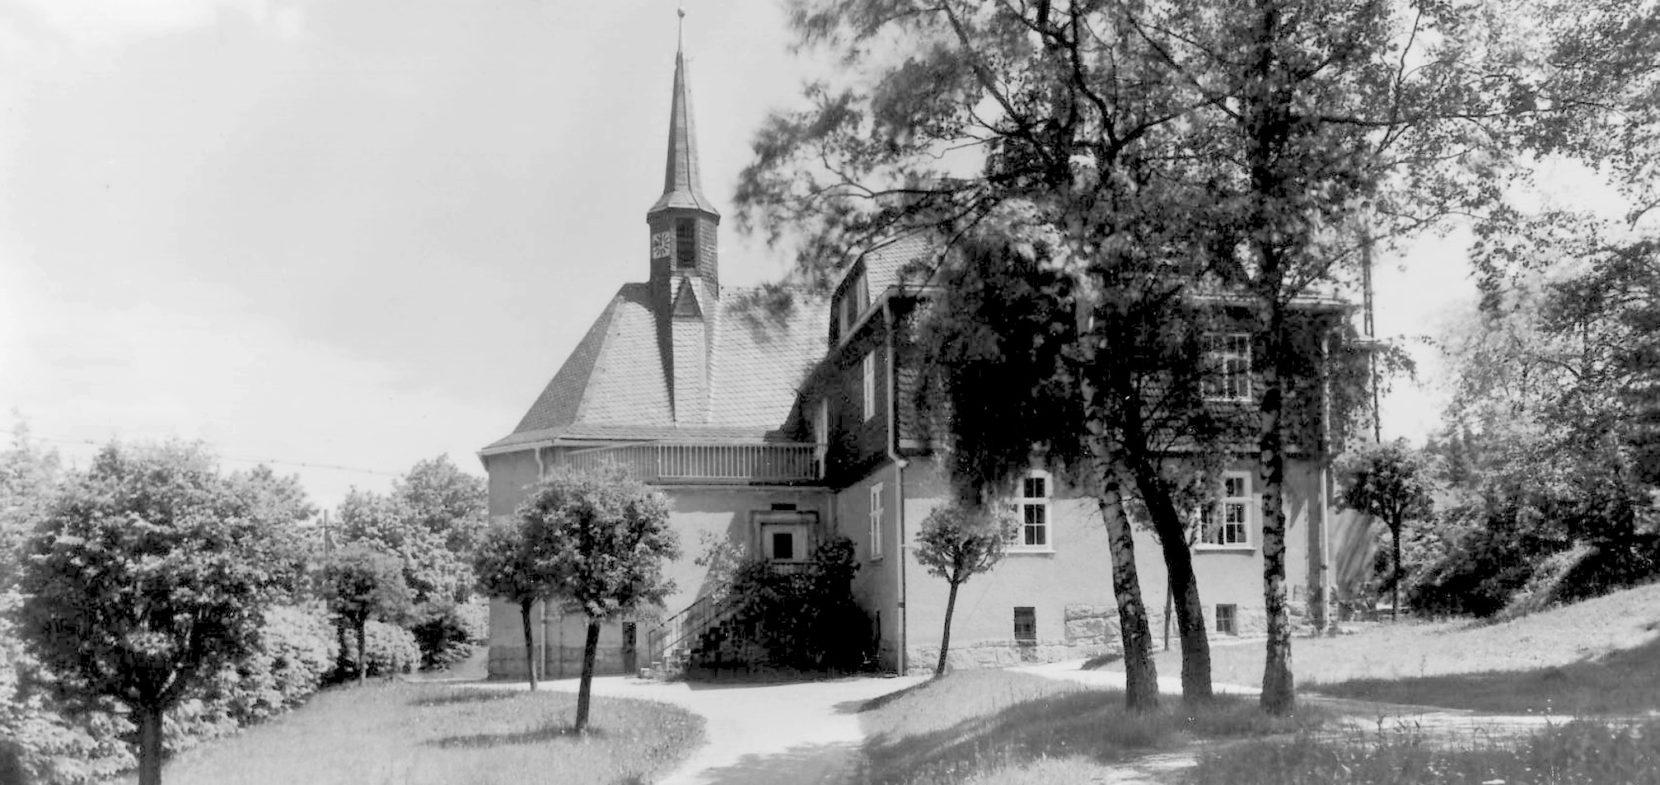 Chronik der Paul-Gerhardt Kirche Schnarrtanne-Vogelsgrün